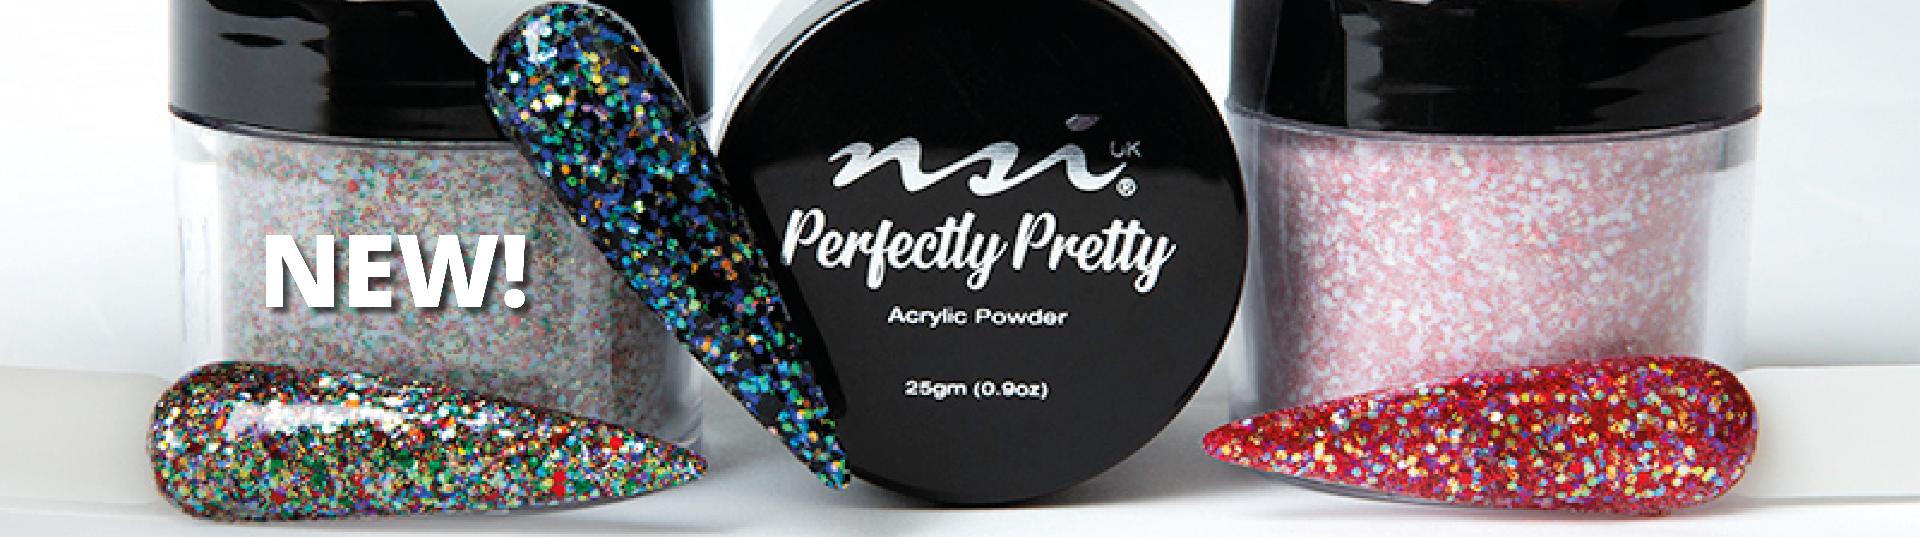 New Perfectly Pretty Powders